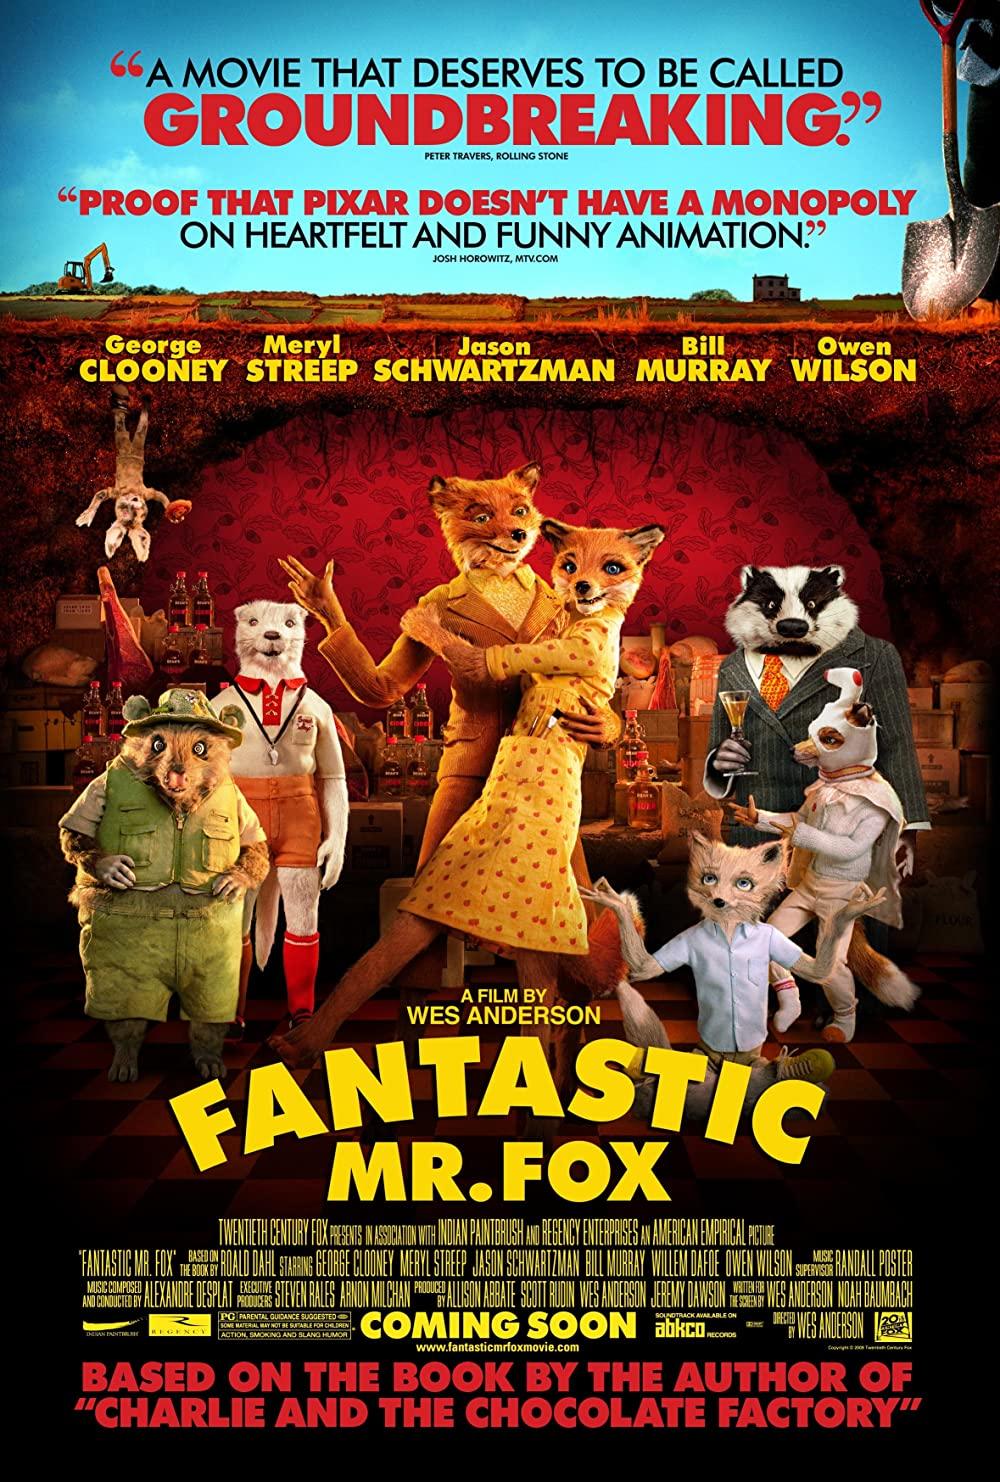 Poster for Fantastic Mr. Fox